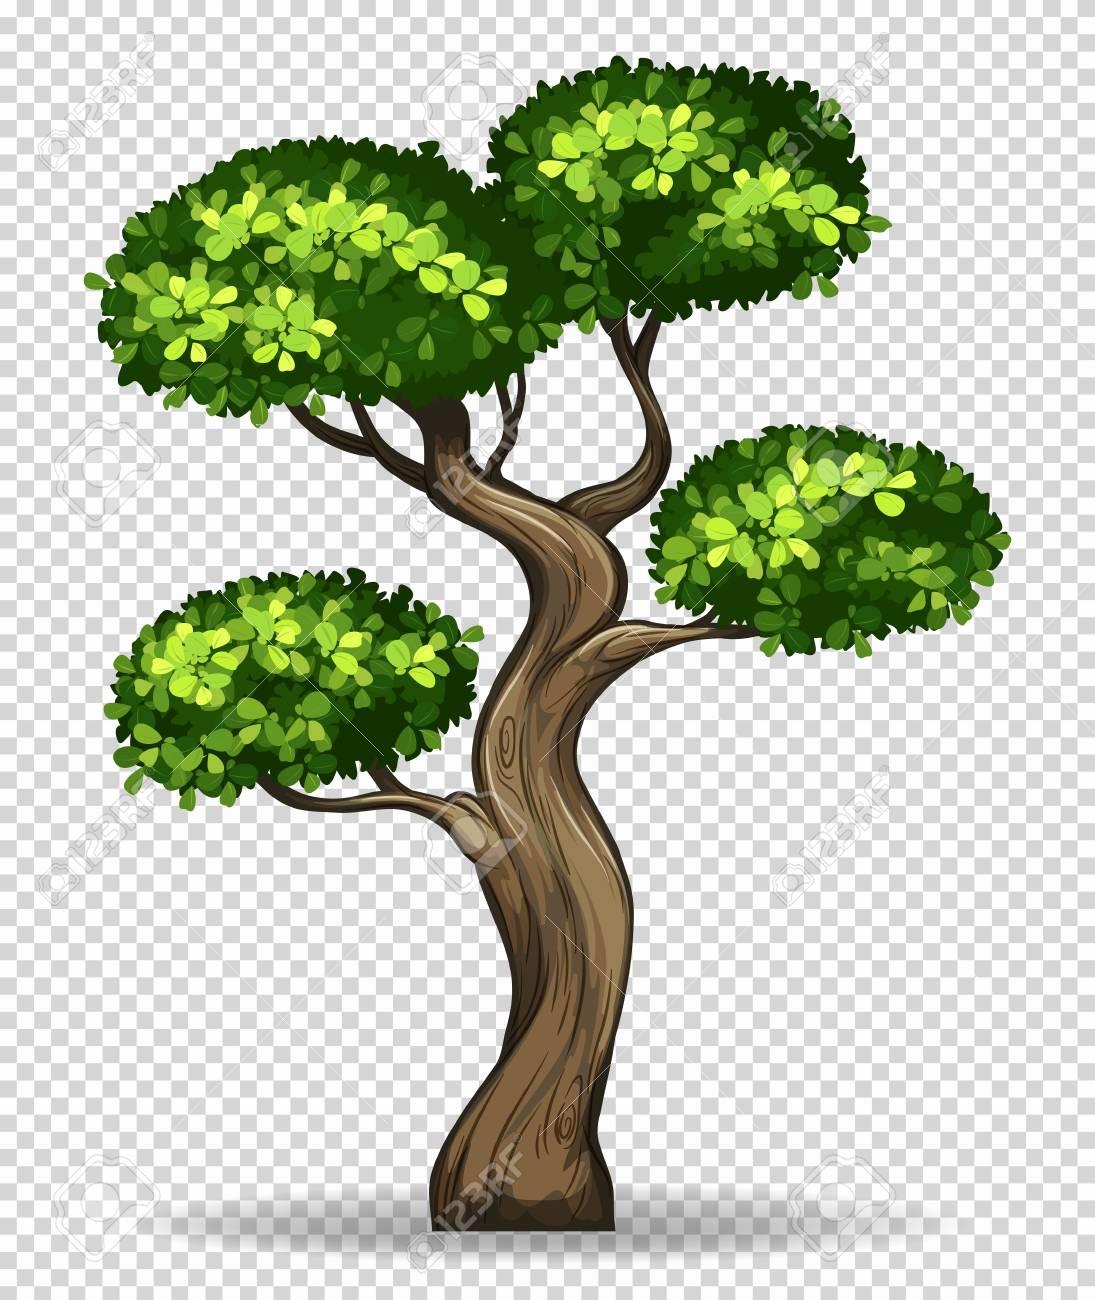 Png Clipart Clip Art Tree Transparent Backgroun